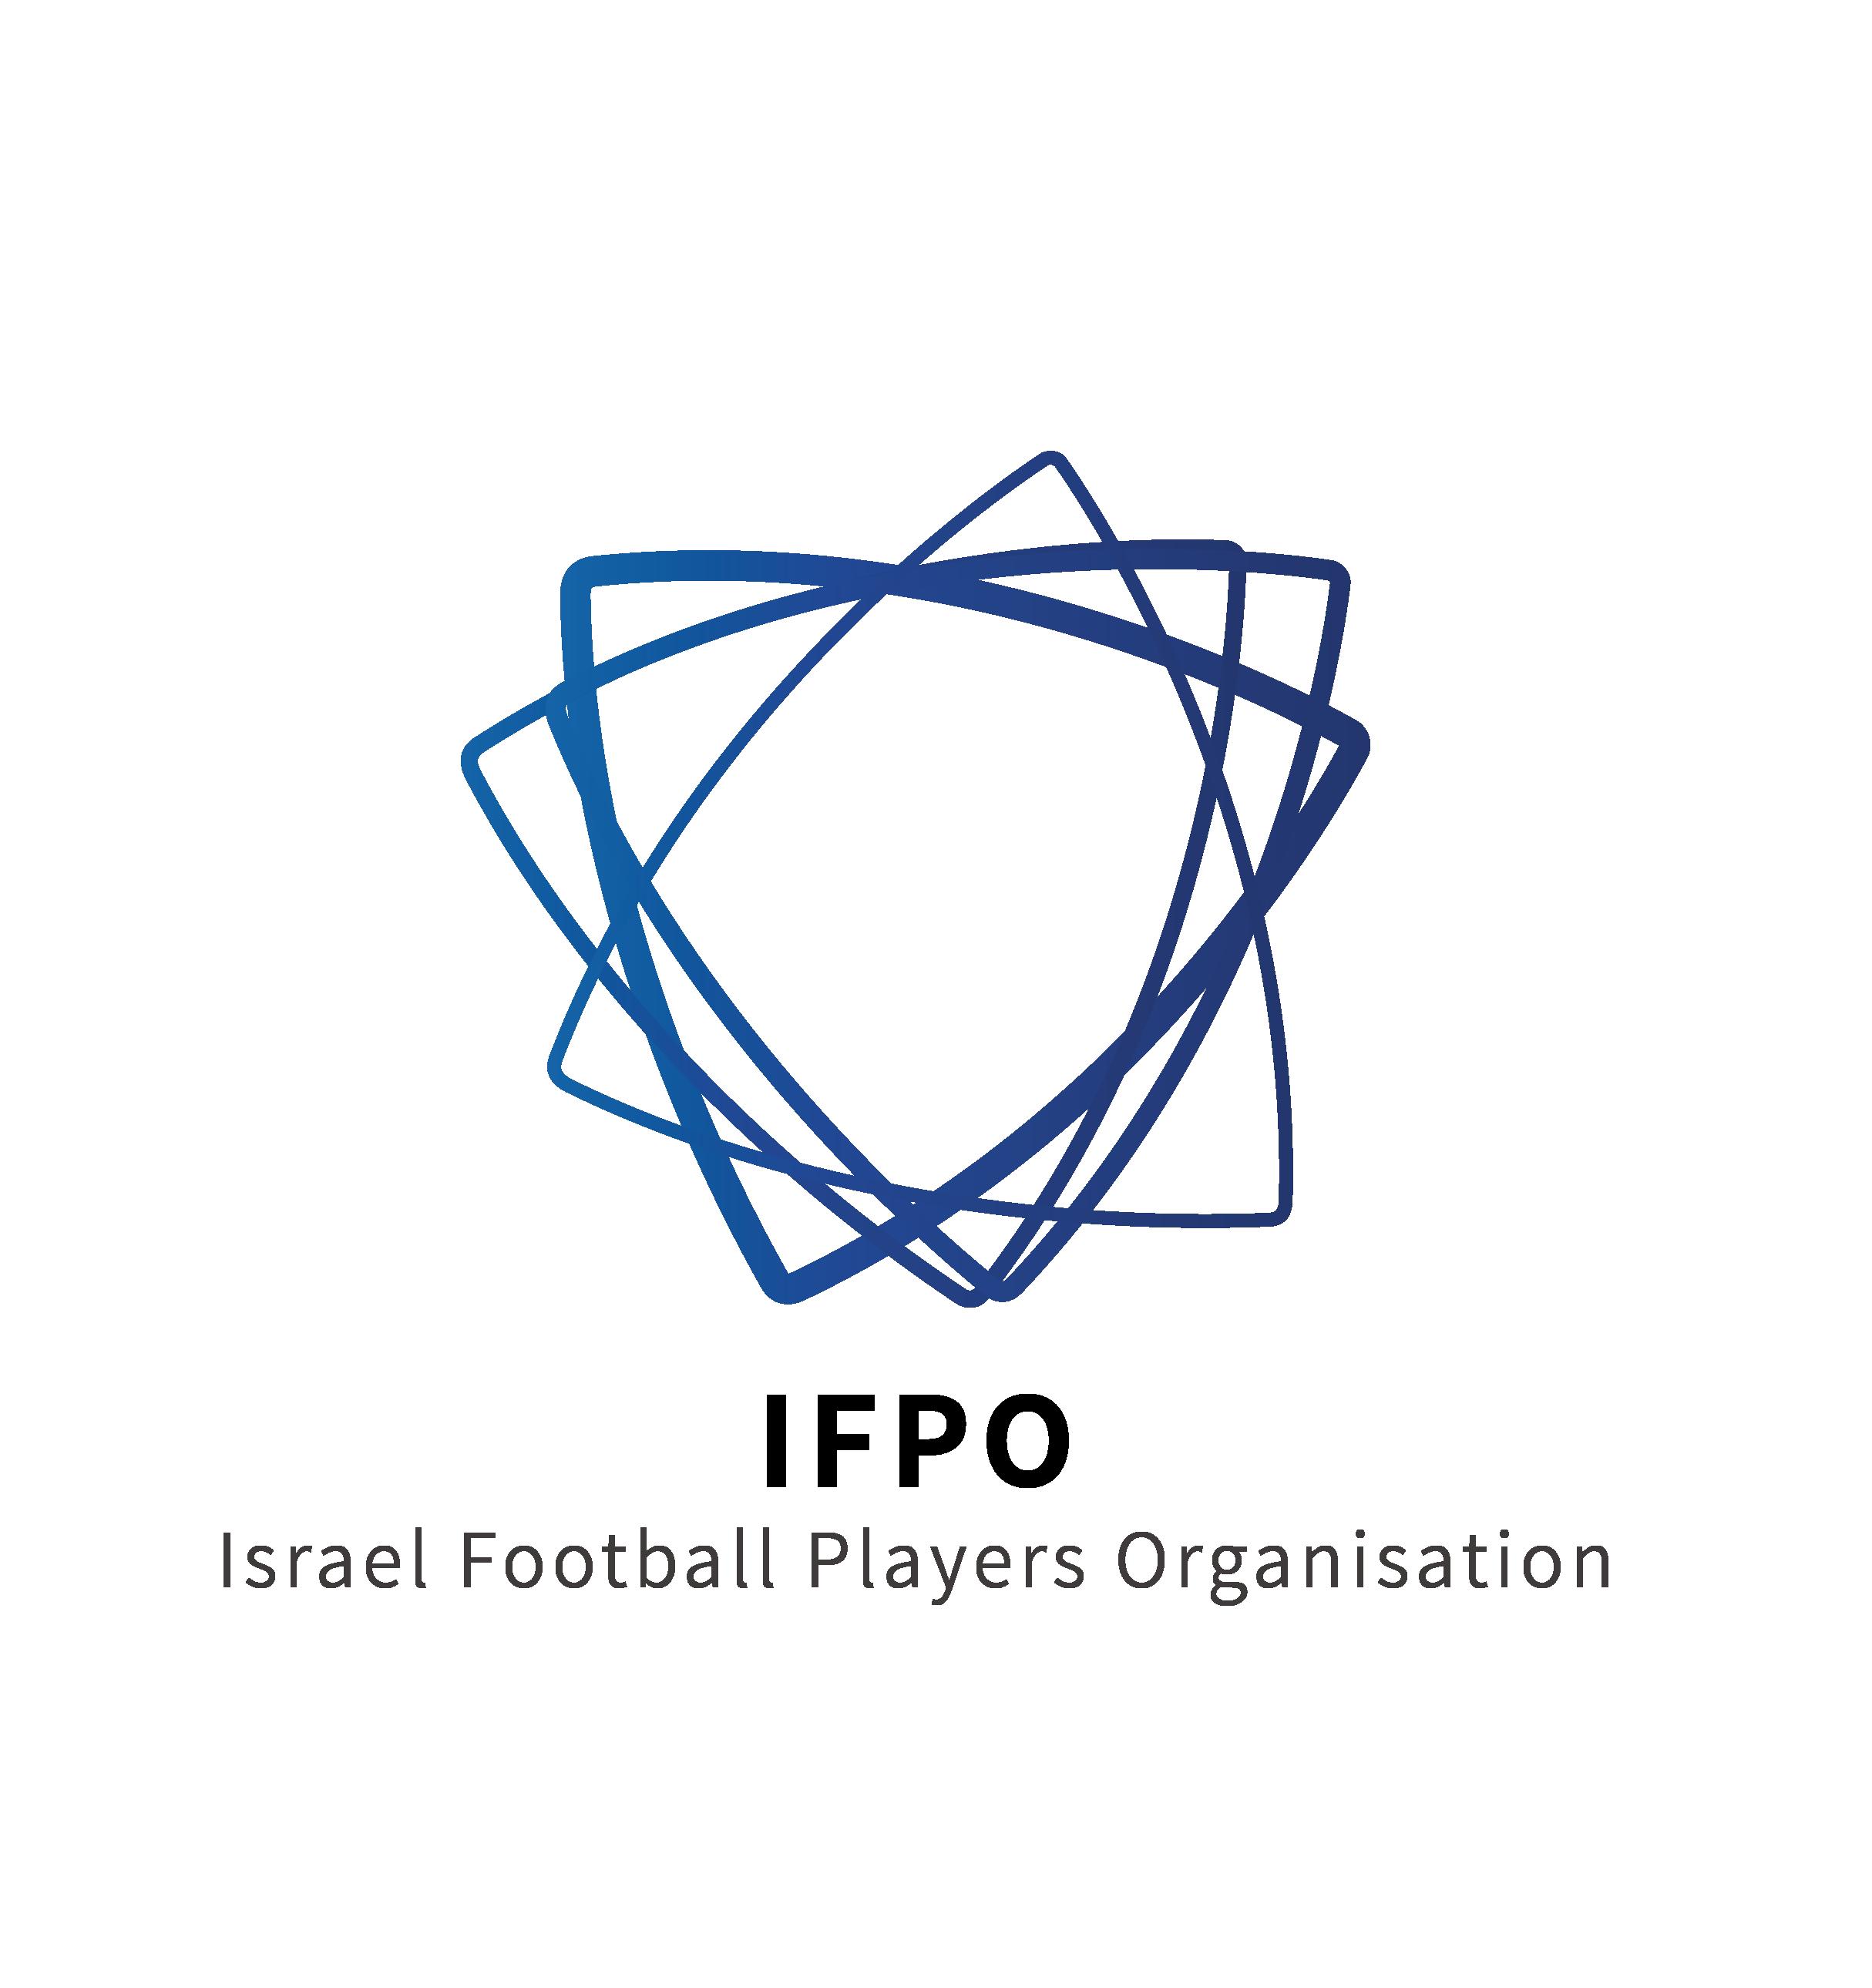 The New Israeli Football Players Association